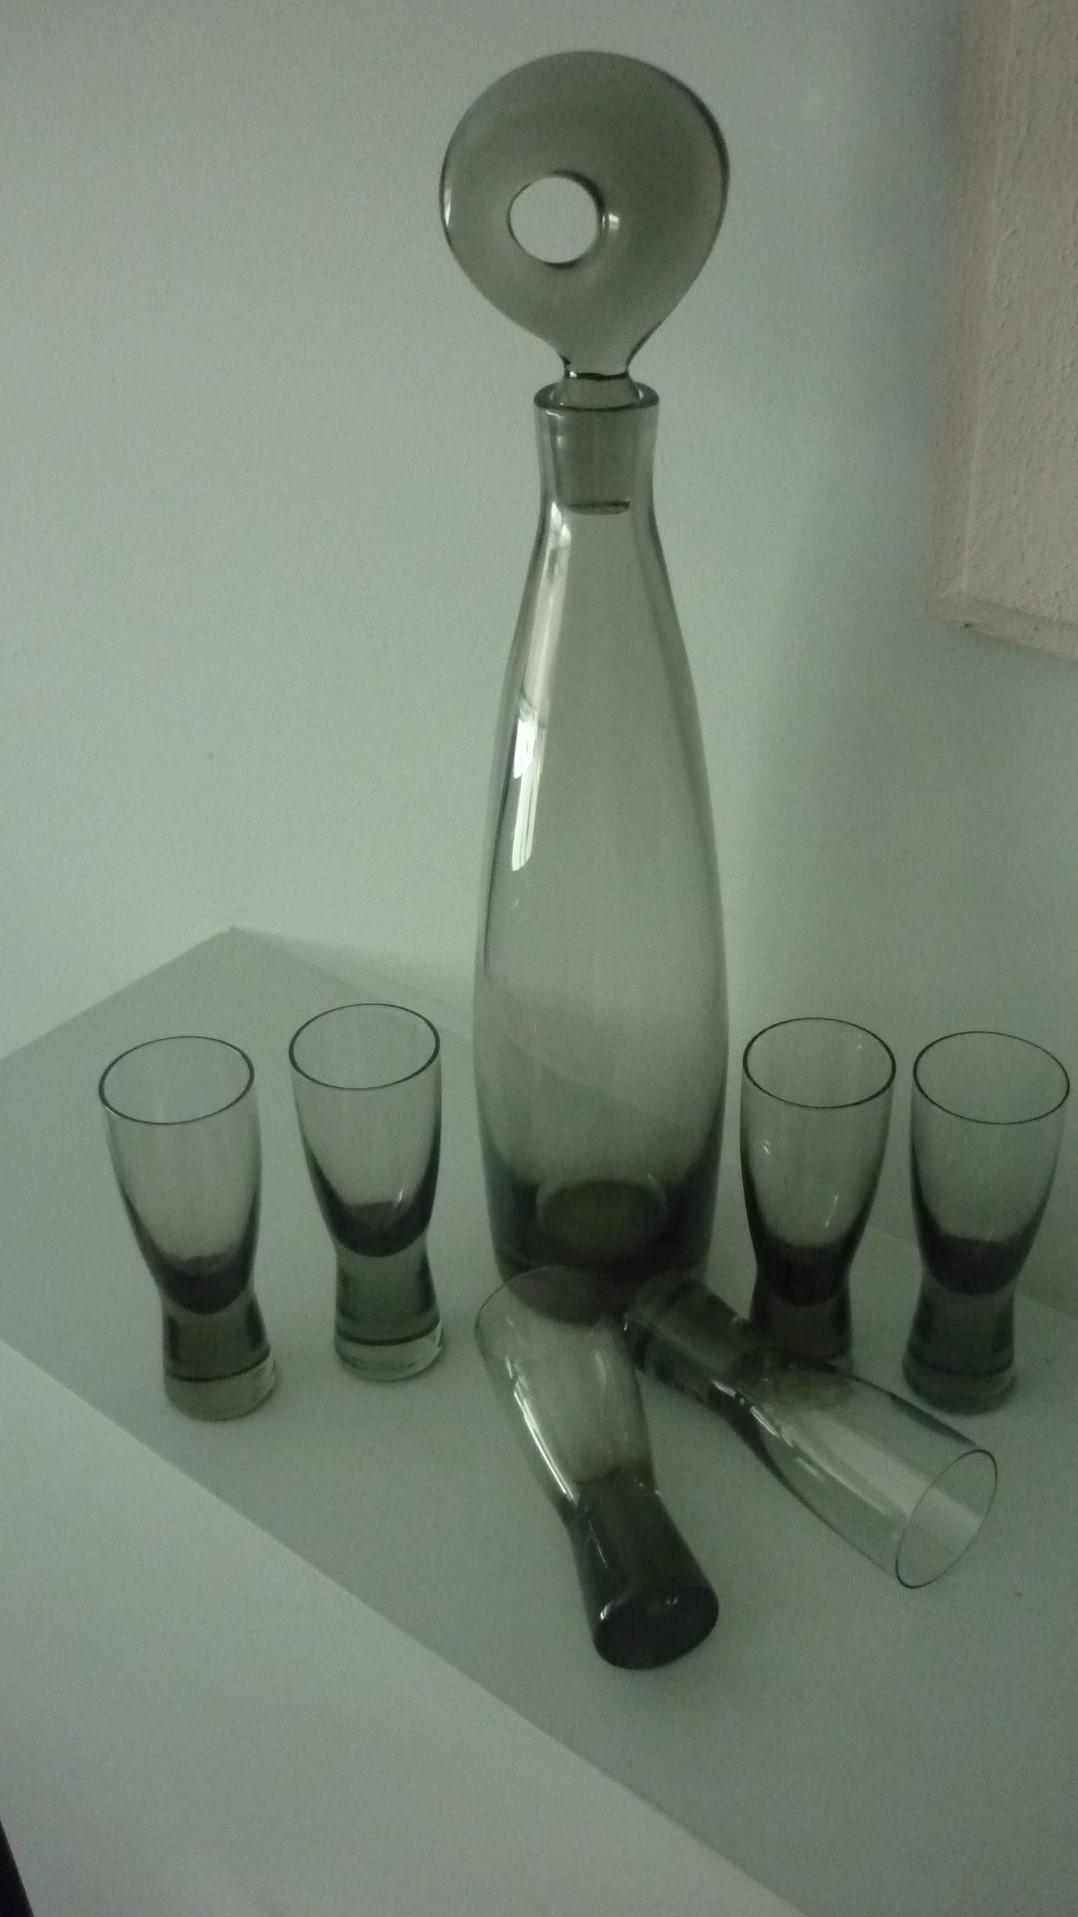 Per Lutken 1950s vintage Holmegaard Aristocrat Decanter and six matching shot glasses